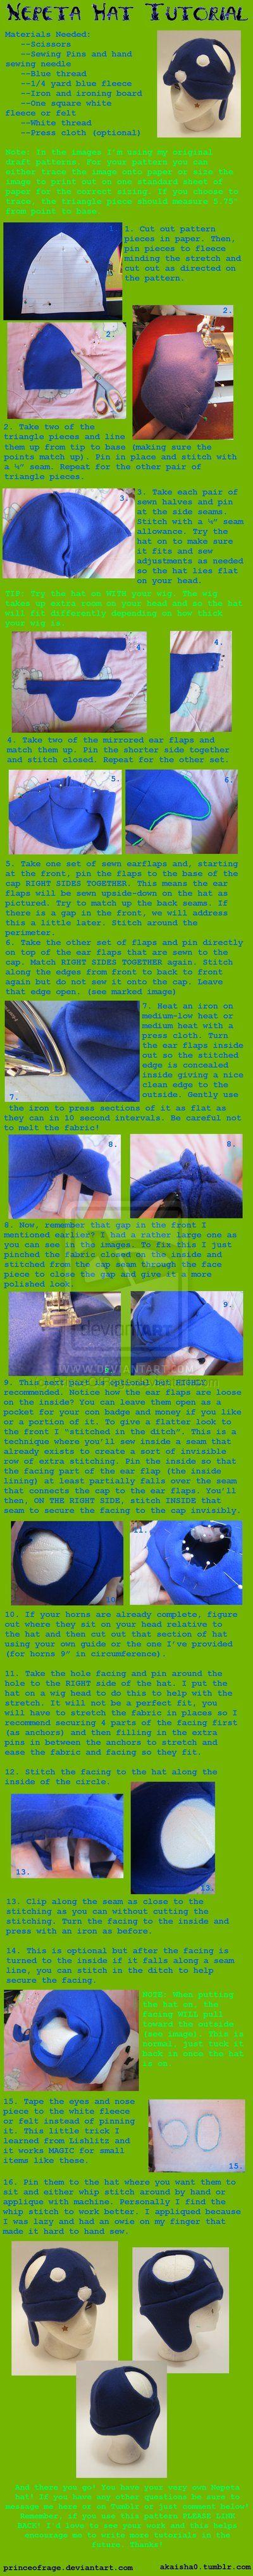 Nepeta Hat Sewing Tutorial by PrinceOfRage.deviantart.com on @deviantART